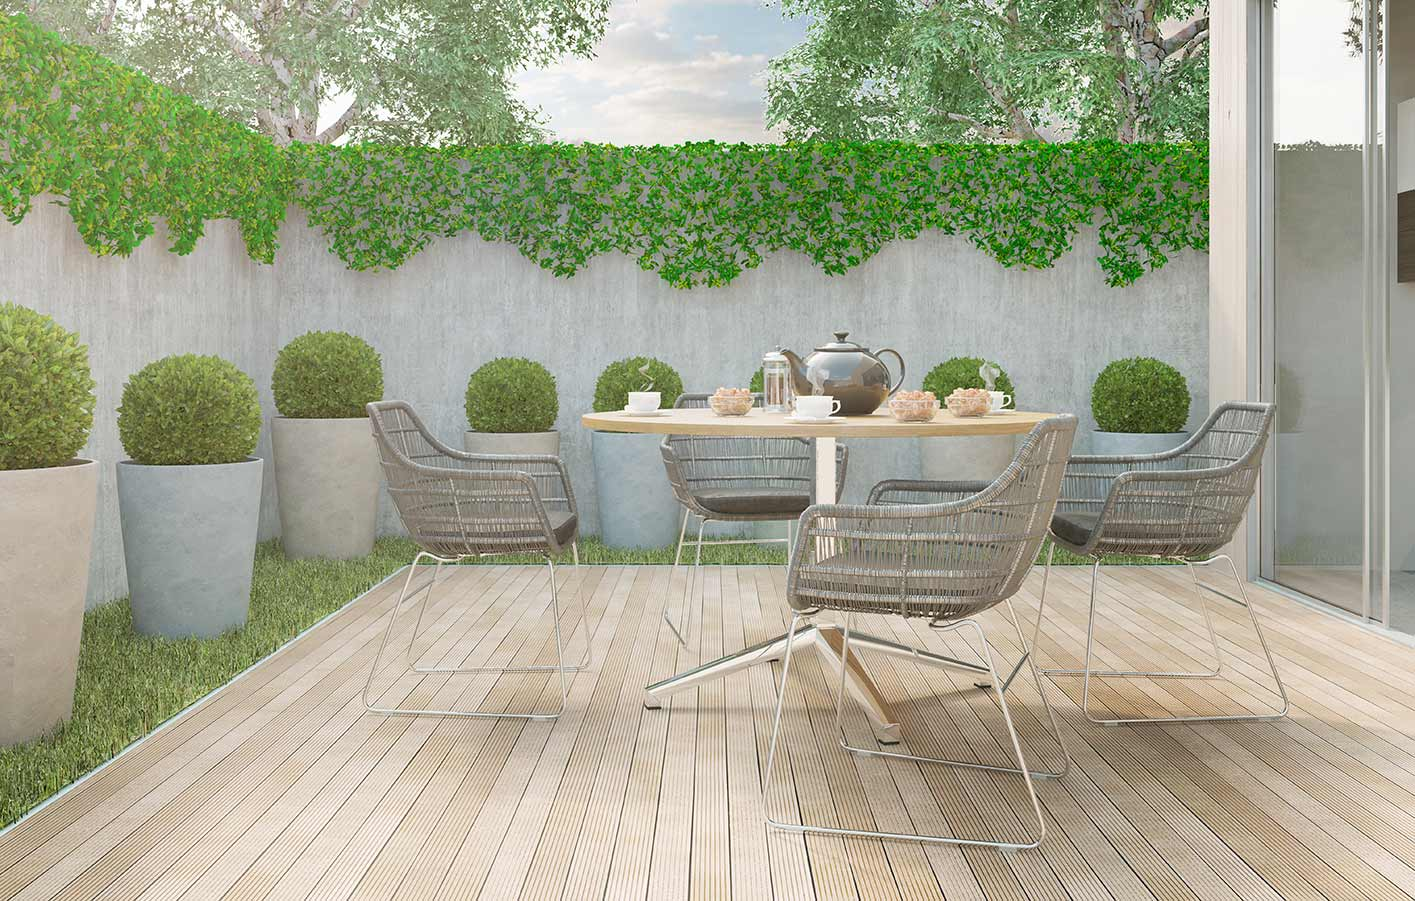 laminat boden terrasse garten t ren hohenfurch schongau peiting landsberg home holz fichtl. Black Bedroom Furniture Sets. Home Design Ideas